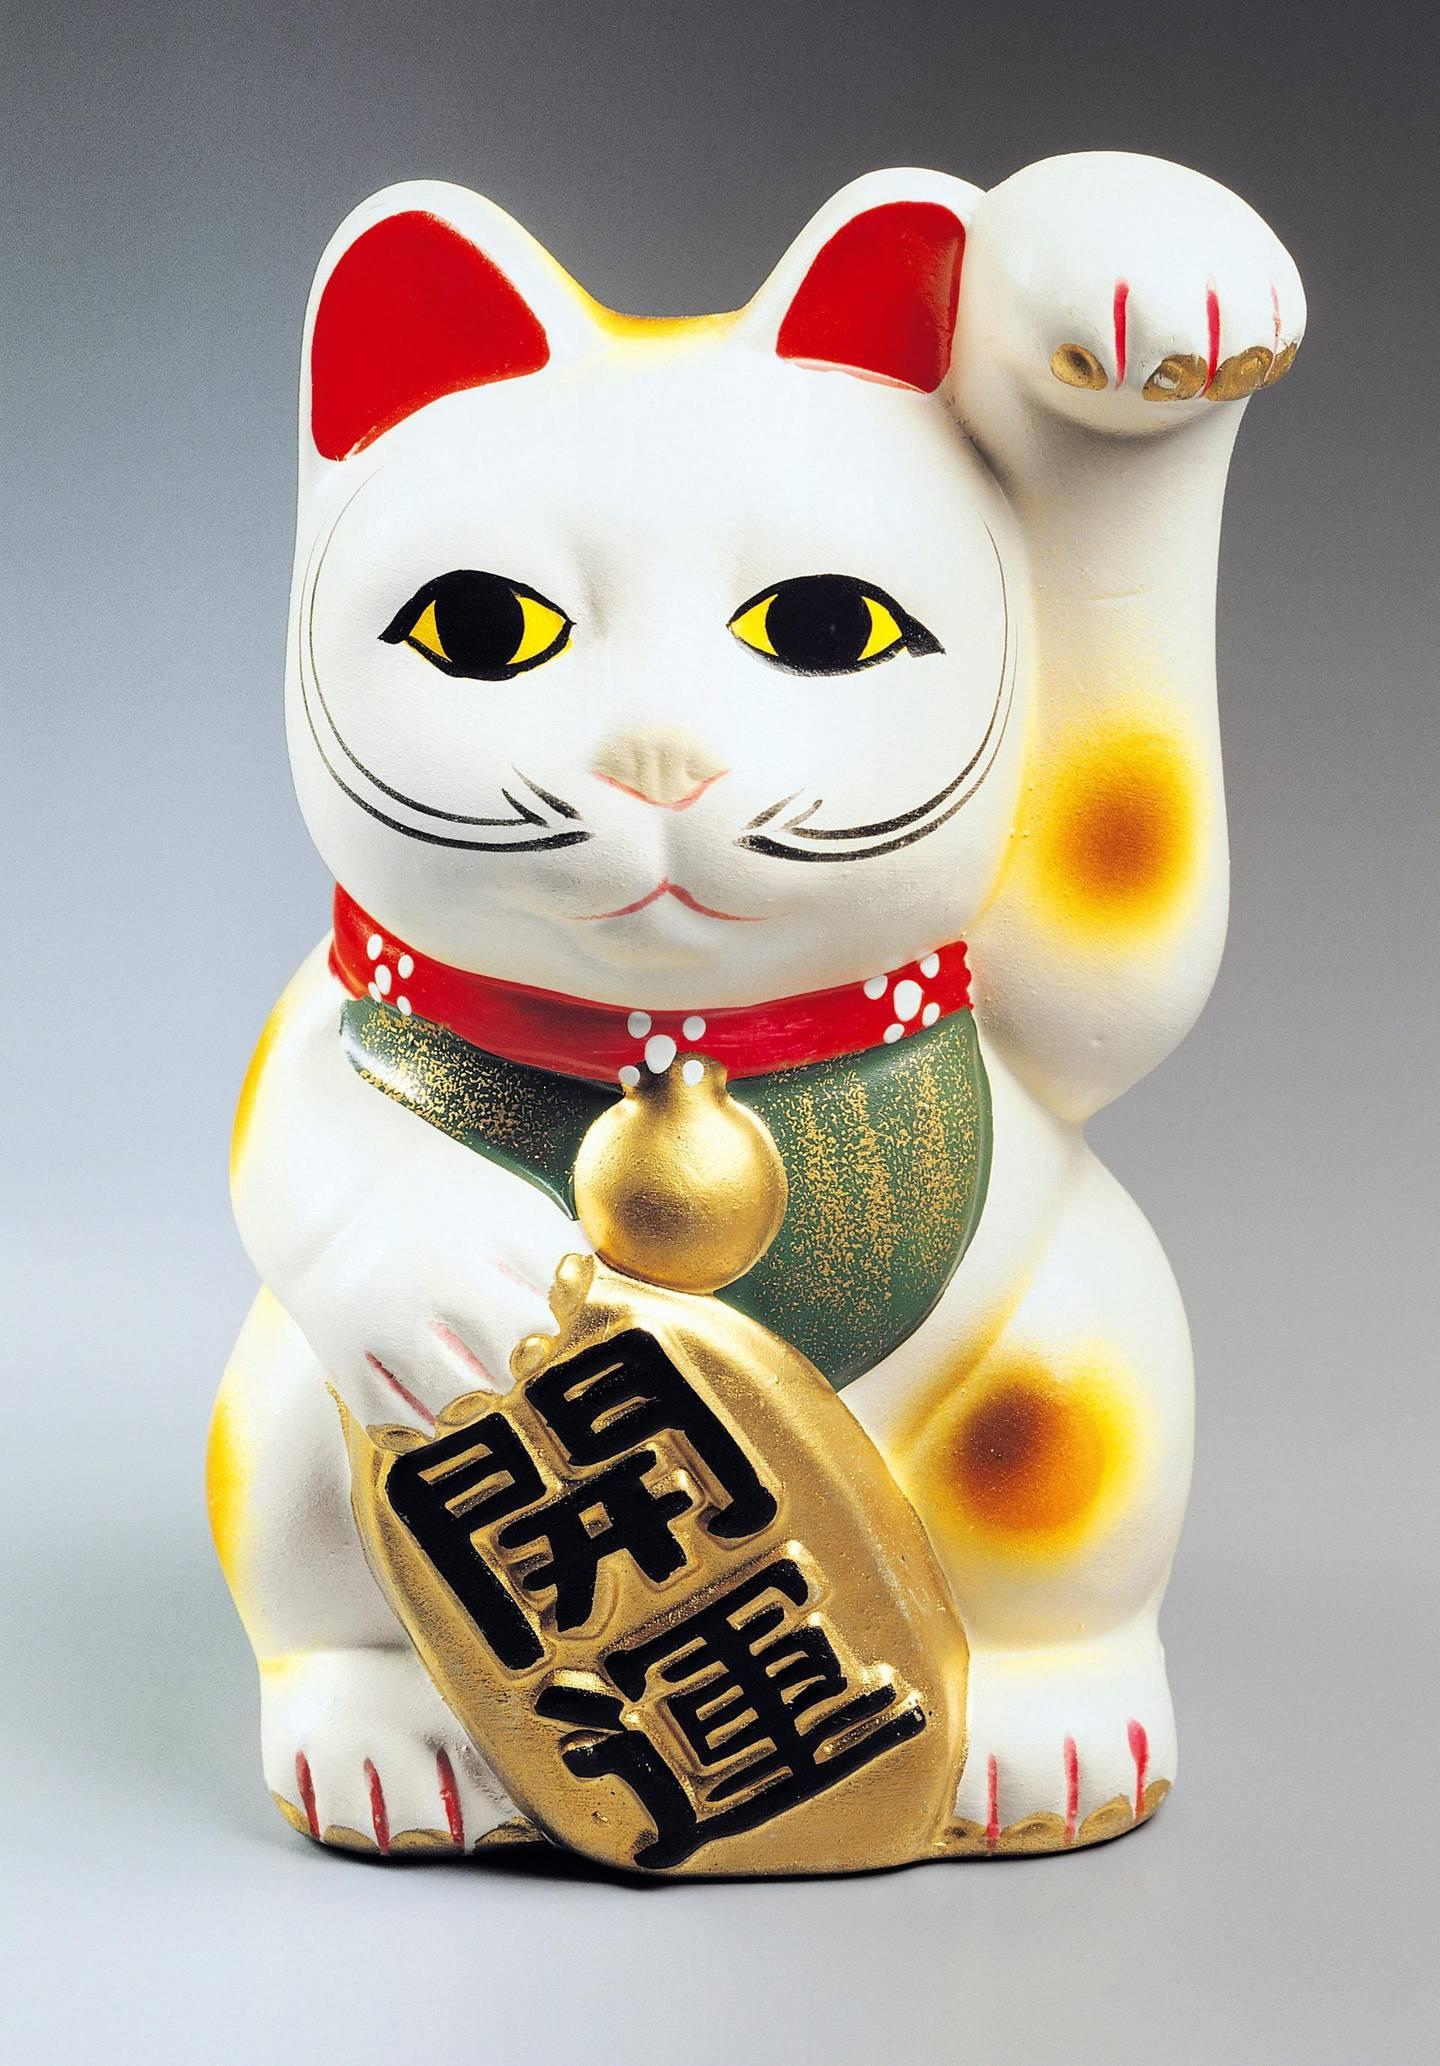 JAPAN - OCTOBER 13: Maneki neko, cat-shaped porcelain sculpture, a common Japanese talisman. Japan, 20th century. (Photo by DeAgostini/Getty Images)